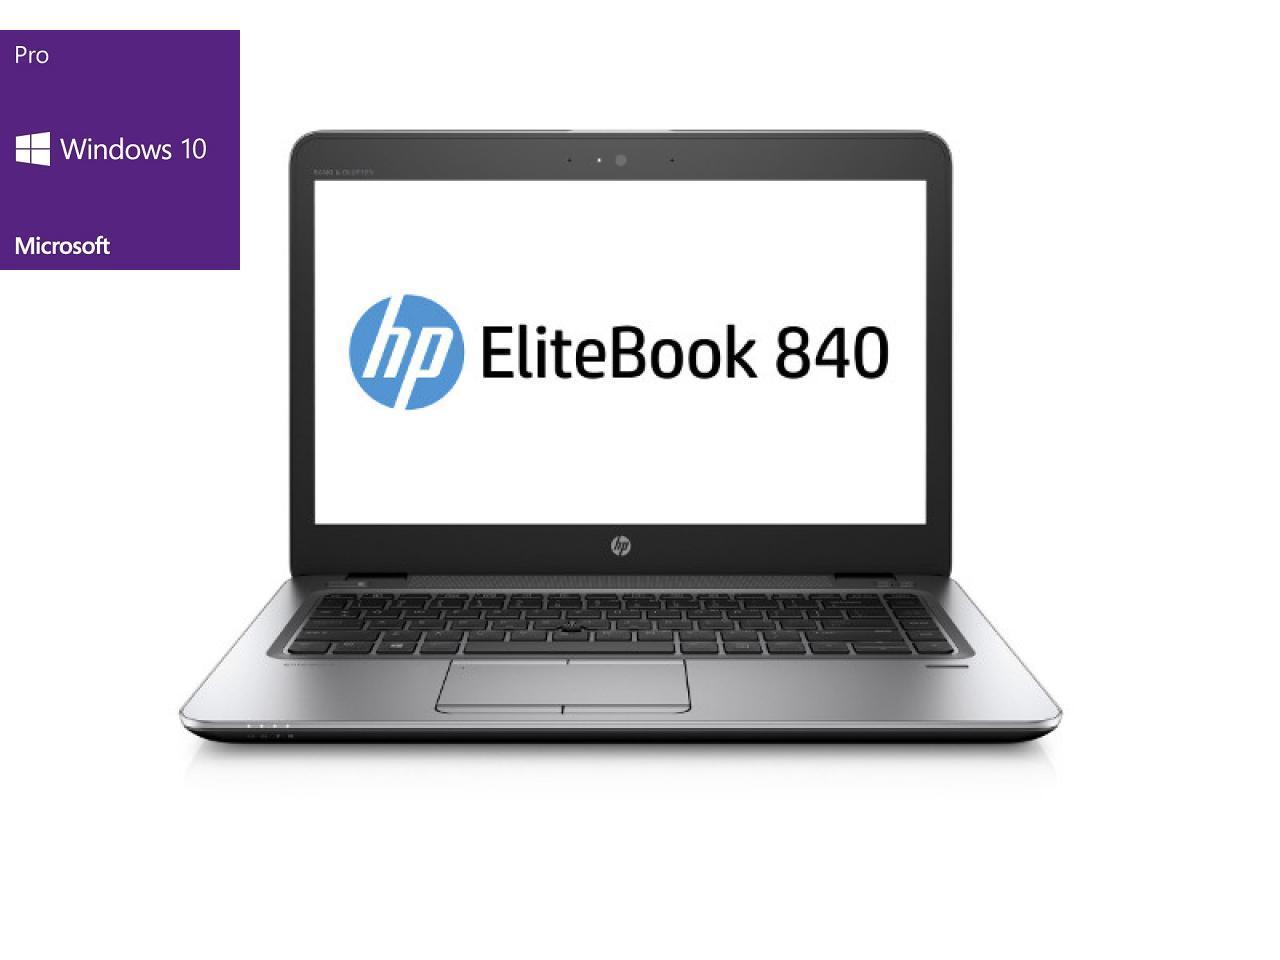 Hewlett Packard EliteBook 840 G4